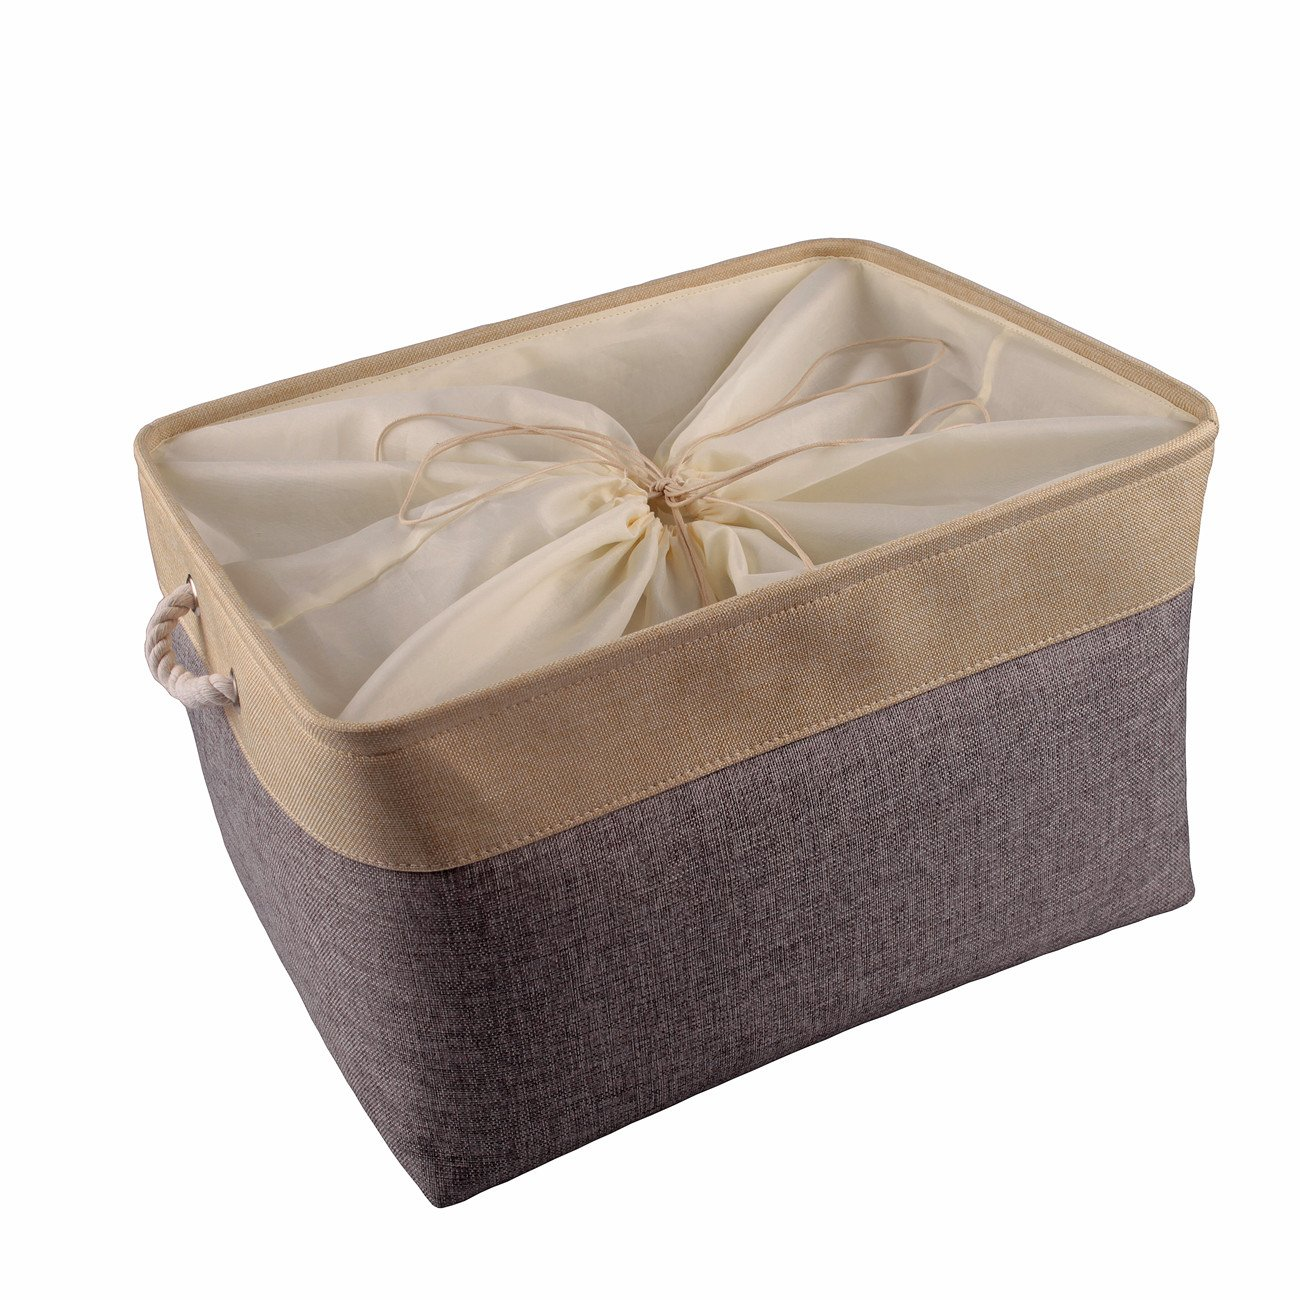 TheWarmHome Decorative Jumbo Storage Basket Rectangular Fabric Storage Bin Organizer Basket with Handles for Clothes Storage Empty Gift Basket (Grey Patchwork, 17.7L×13.8W×9.8H)